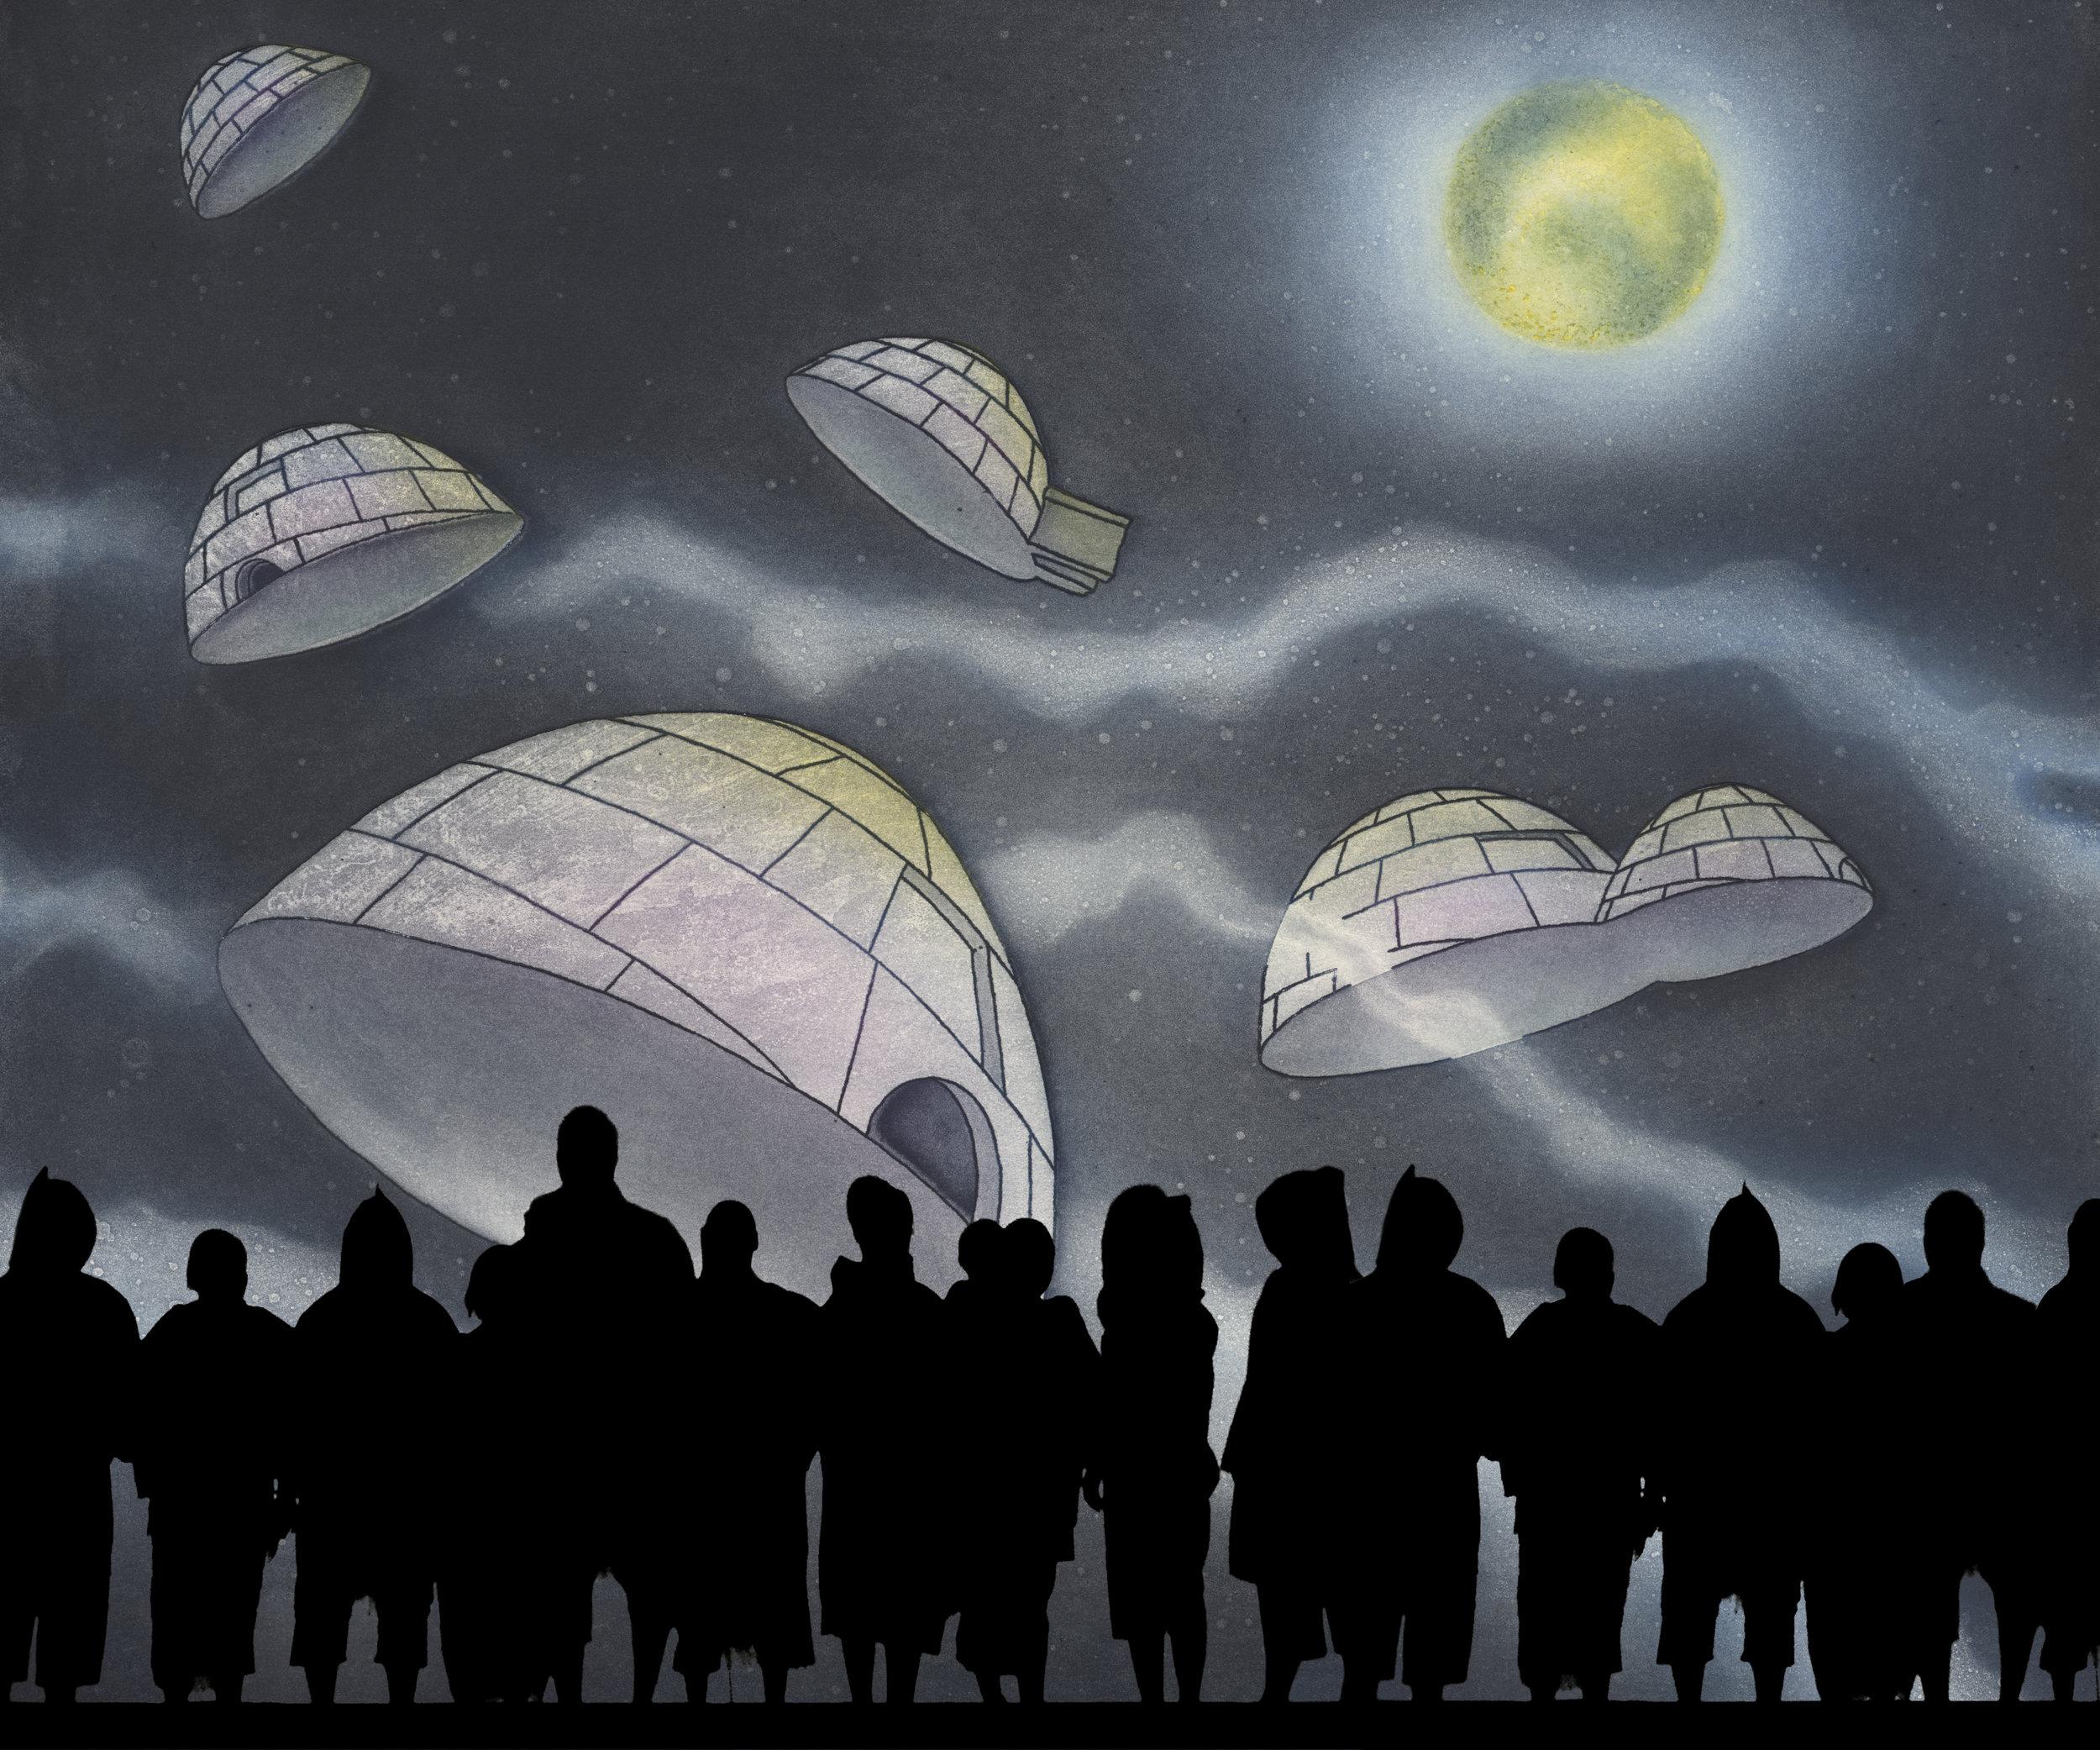 ᐅᓂᒃᑳᖅᑐᐊᑦ   (ᐃᒡᓗᓕᒃ, ᓄᓇᕗᑦ)  ᓴᖅᑭᑎᑦᑎᕗᑦ ᐋᑦᓯᖅ, ᐅᐃᕖᑦ, ᑕᖅᑯᑦ ᓄᐃᑎᑕᖏᑦ. ᐅᑯᐊ ᐱᓕᕆᖃᑎᒌᑦᑐᑦ ᑲᑎᑦᑐᑎᒃ ᖃᕋᓴᐅᔭᒃᑯᑦ ᓄᐃᓴᑎᑦᑎᓪᓗᑎᒃ, ᑕᕐᕋᓕᔮᖅᑐᓂᒃ. ᐱᓪᓚᕆᓐᖑᐊᖅᑐᑦ, ᓂᔾᔭᐅᓯᔭᖅᑐᑦ ᐃᖃᐃᓐᓂᕐᒥᒃ ᑕᑯᔅᓴᐅᑎᑦᑎᔪᑦ ᑕᐅᑐᕋᓐᓈᖅᑐᓂᒃ ᐅᐊᑦᑎᐊᕈᓐᓂᓴᕐᒧᑦ ᐃᓯᖅᑎᑦᑎᓂᕐᒧᑦ ᐃᓅᓯᕐᒧᑦ ᑐᖁᒥᒃ ᖃᐅᔨᒪᓯᒪᓐᖏᑦᑐᓄᑦ, ᐅᓗᐃᑦ ᖃᐅᒻᒪᕐᓇᓵᖅᑐᑦ, ᐃᓄᐃᑦ ᖃᓪᓗᓈᓂᒃ ᑲᑎᓯᓚᐅᖅᓯᒪᑎᓐᓇᒋᑦ.  Unikkaaqtuat  (Igloolik, Nunavut)  features Artcirq, Les 7 doigts de la main & Taqqut Productions. These collaborators come together to create an atmoshphere shaped by video projections and a world of shadows. Actors, live musicians and acrobats will transport the audience to an ancient world when life had not known death, days had not seen light, and where Inuit had not met white people...